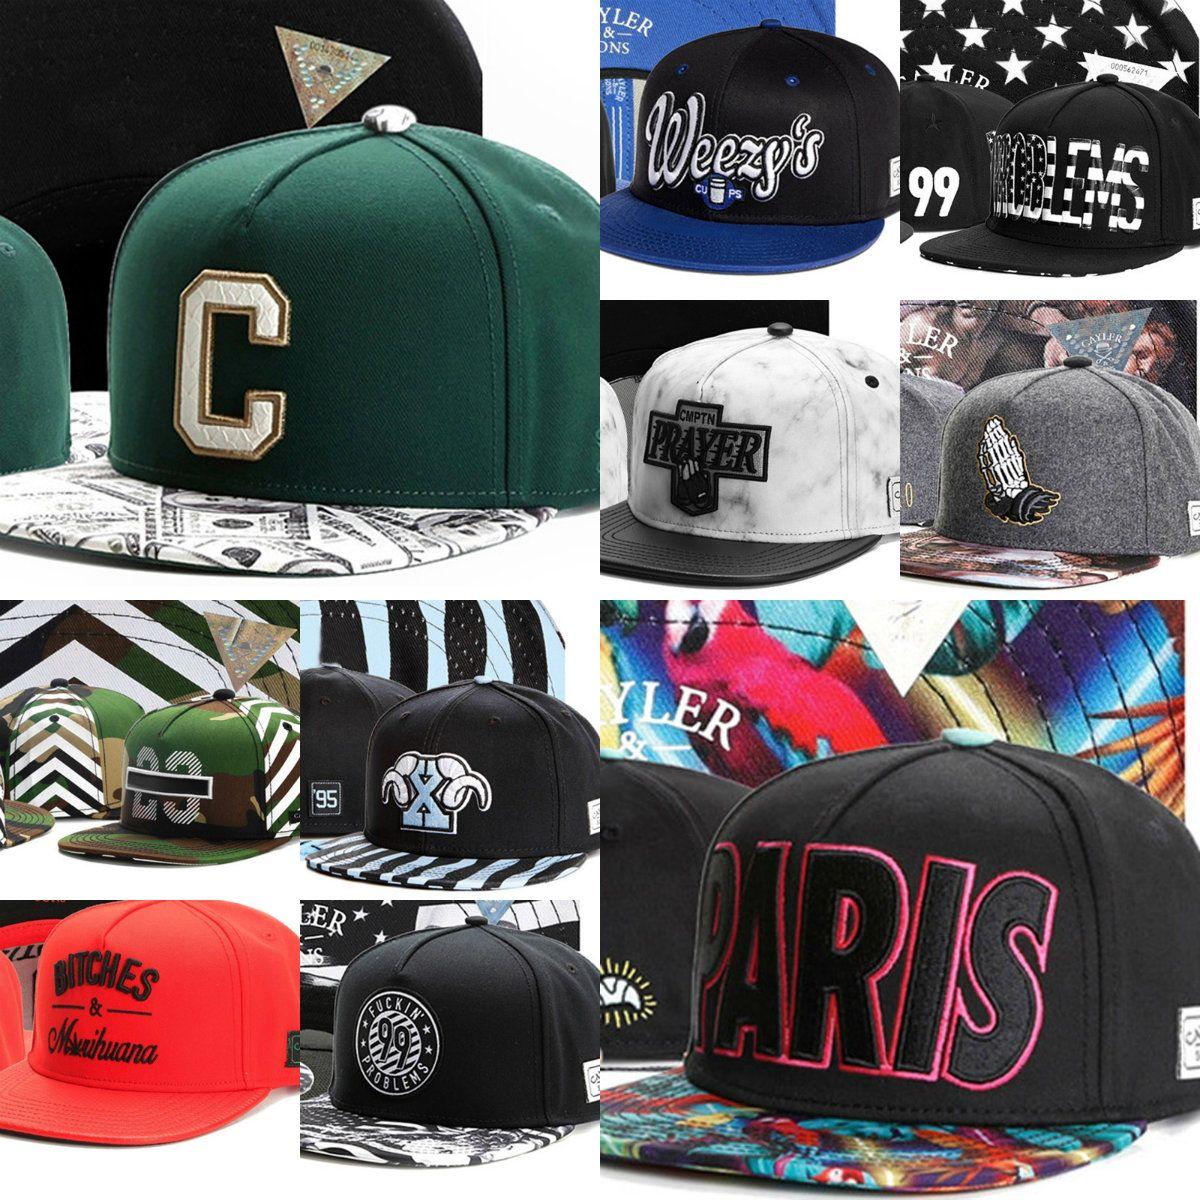 2018 New Brand Designer Hat Fitted Baseball Caps Blue Mens Women Luxury  Snapback Hats For Men Snapbacks Hip Hop Basketball Cap Cappelli Red Cap  Shop Flexfit ... 6bd21a434949